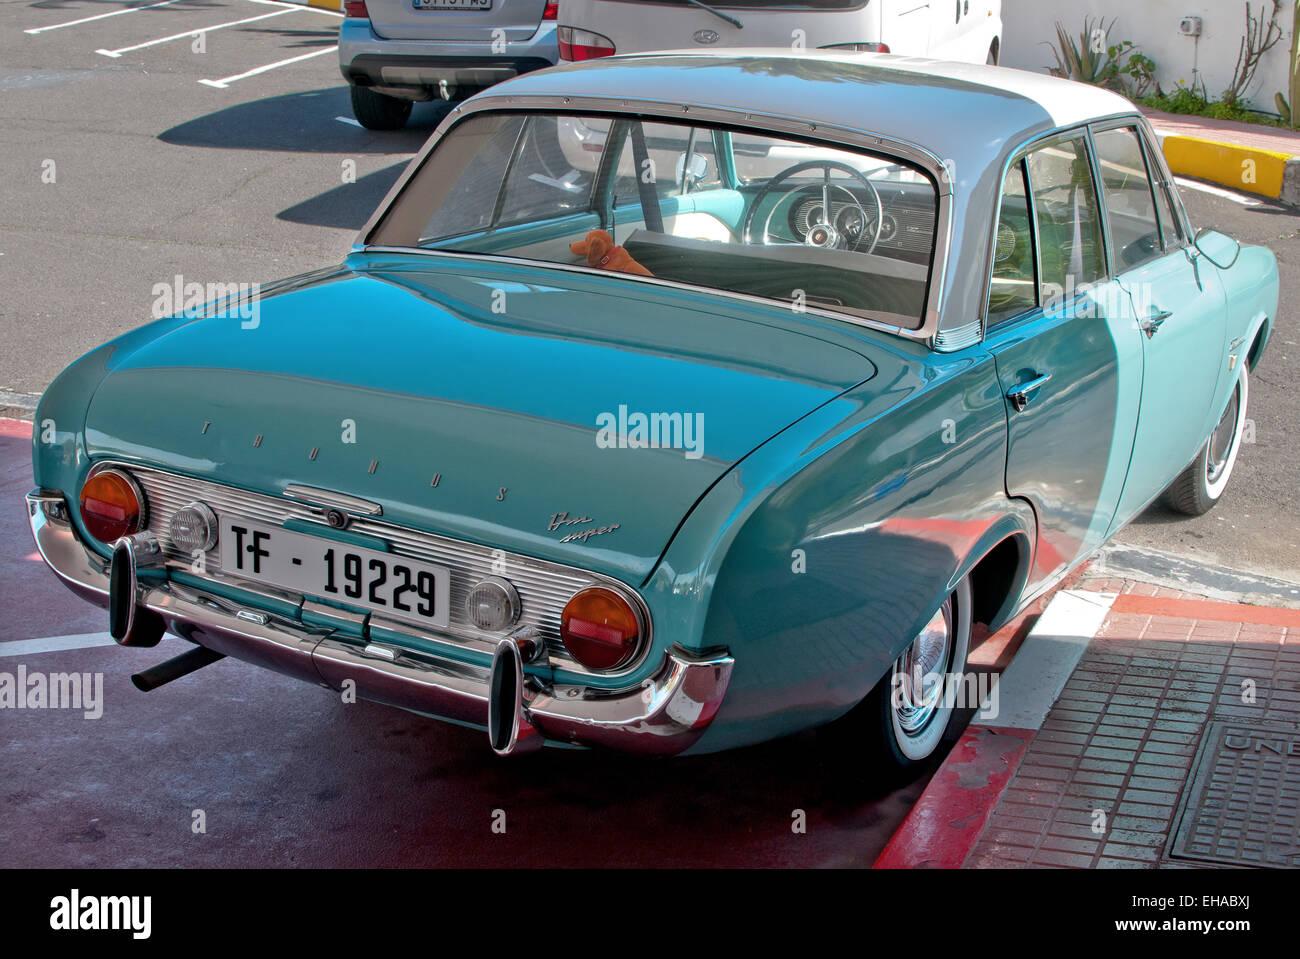 Car, Ford Taunus 17M P3, ' bath tub ', blue, model year 1960-1964 - Stock Image